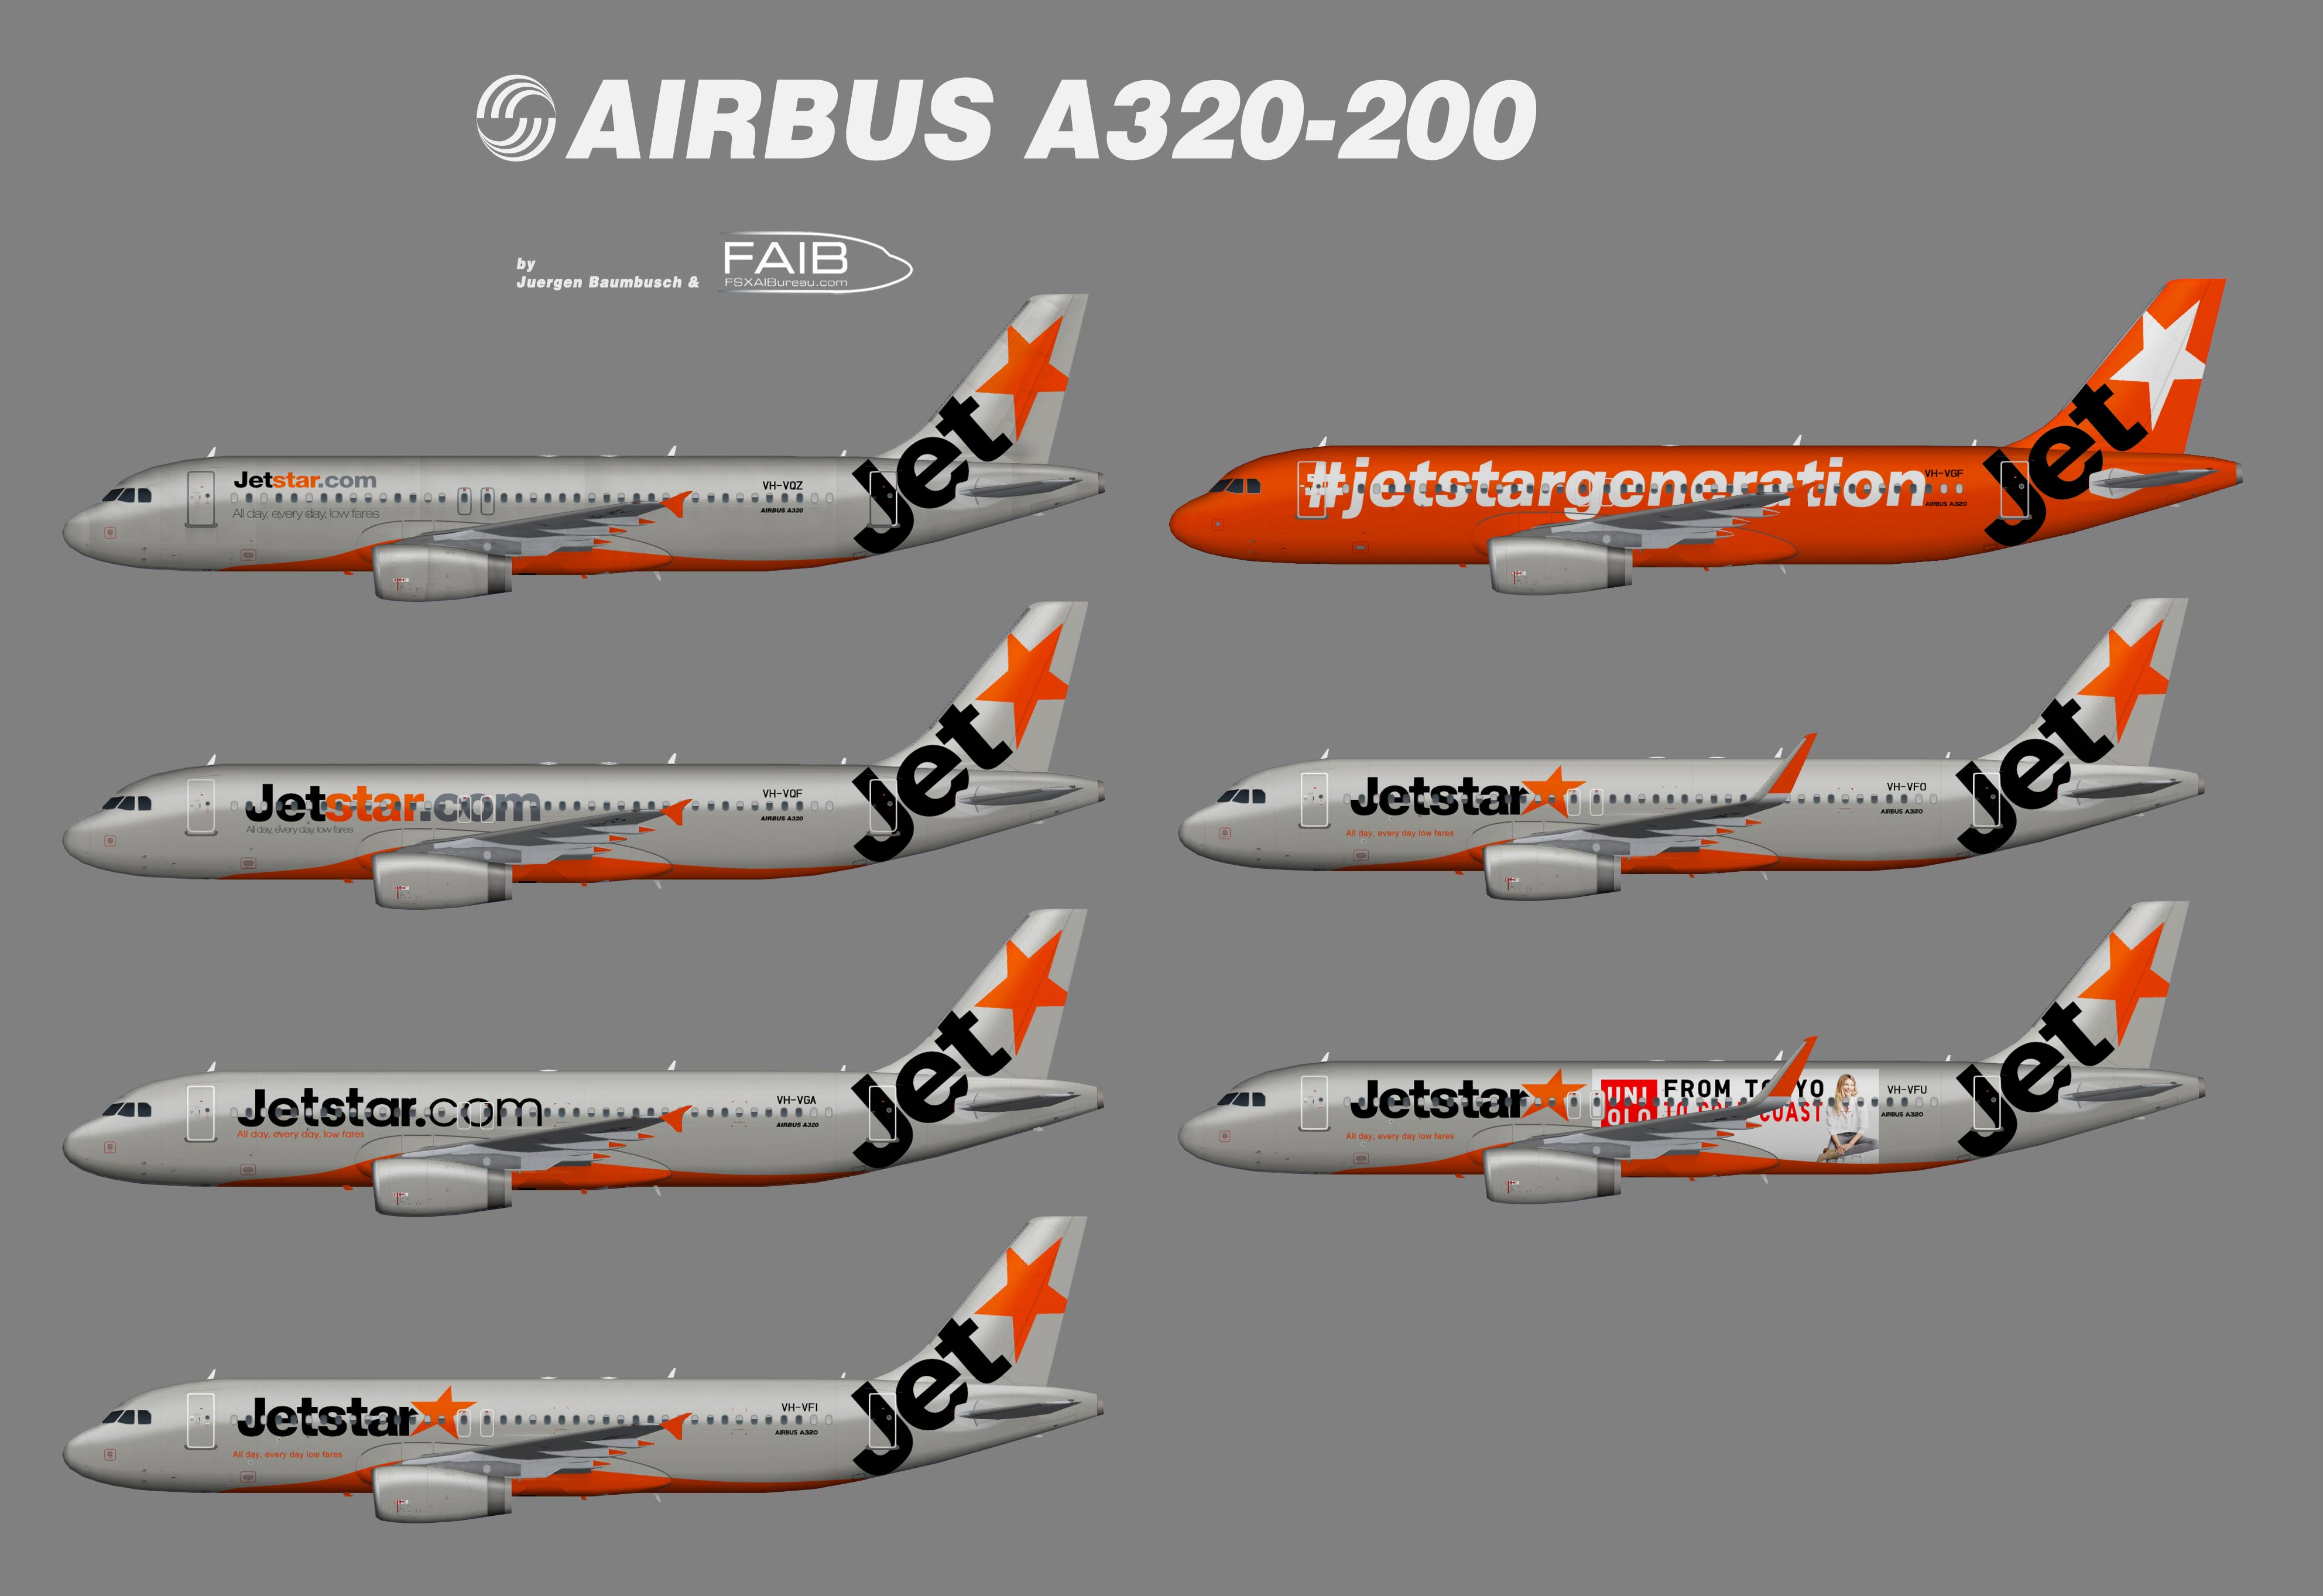 Jetstar Australia Airbus A320-200